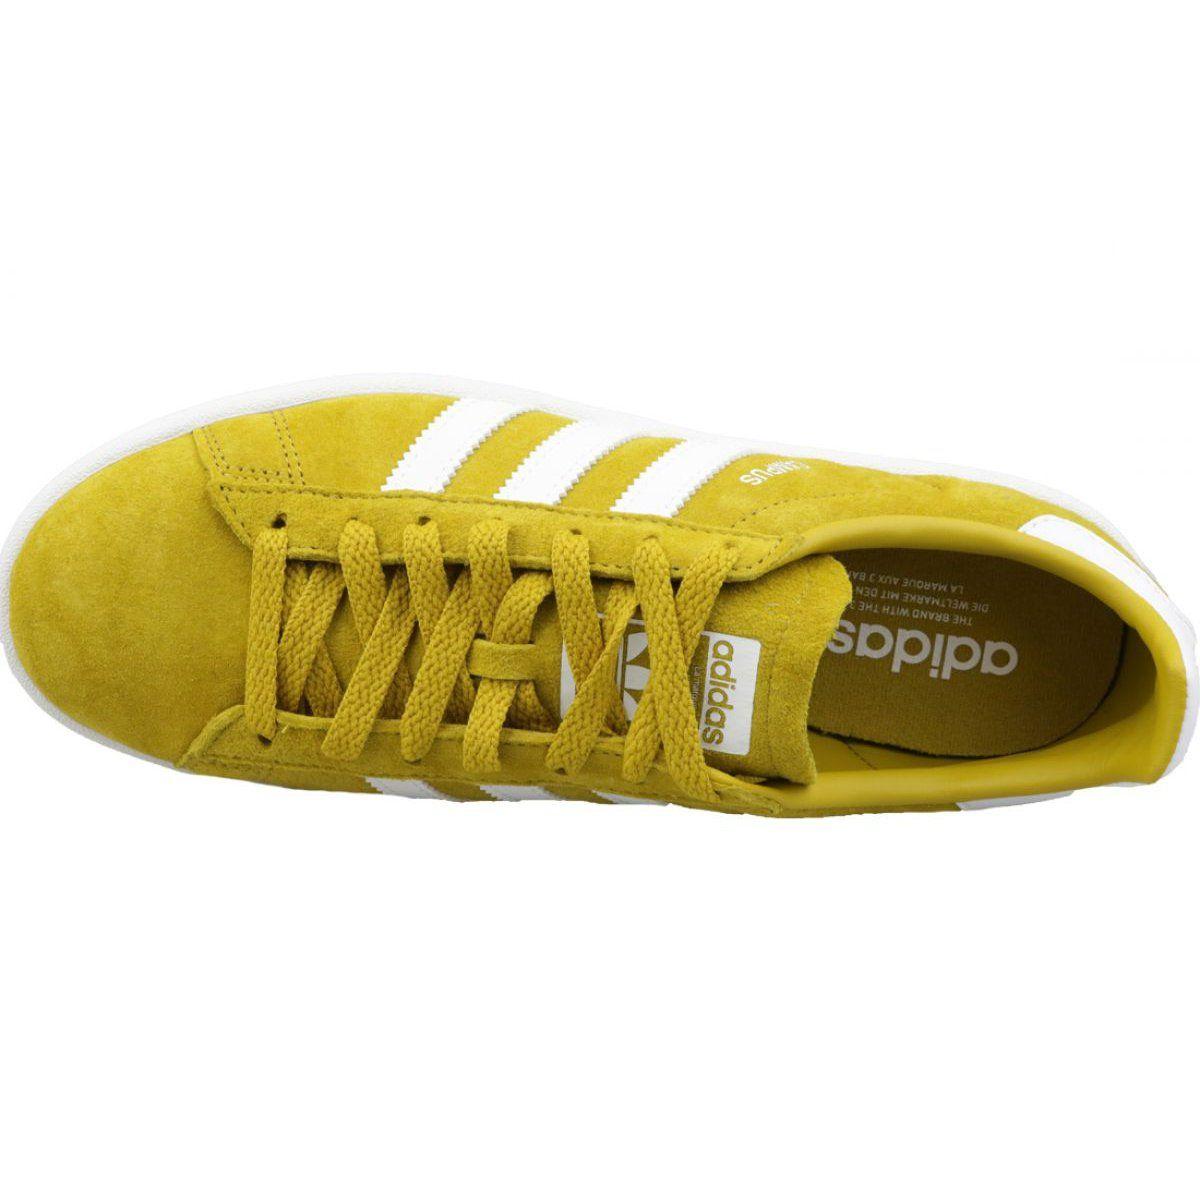 Buty Adidas Originals Campus M Cm8444 Zolte Sports Shoes Adidas Adidas Adidas Originals